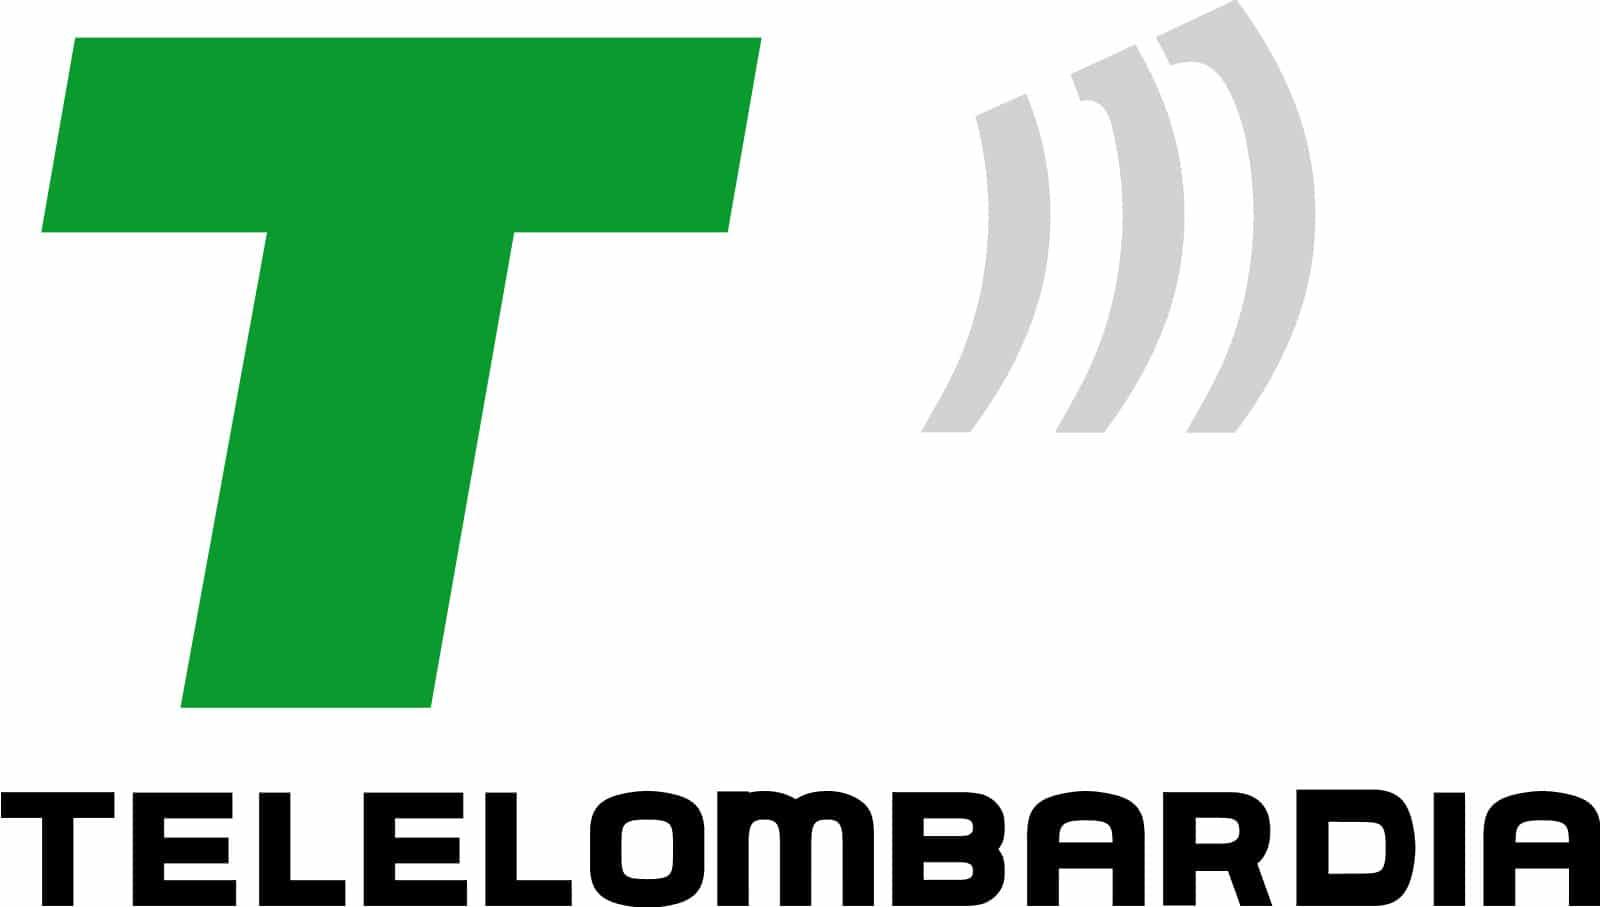 telelombardia-logo